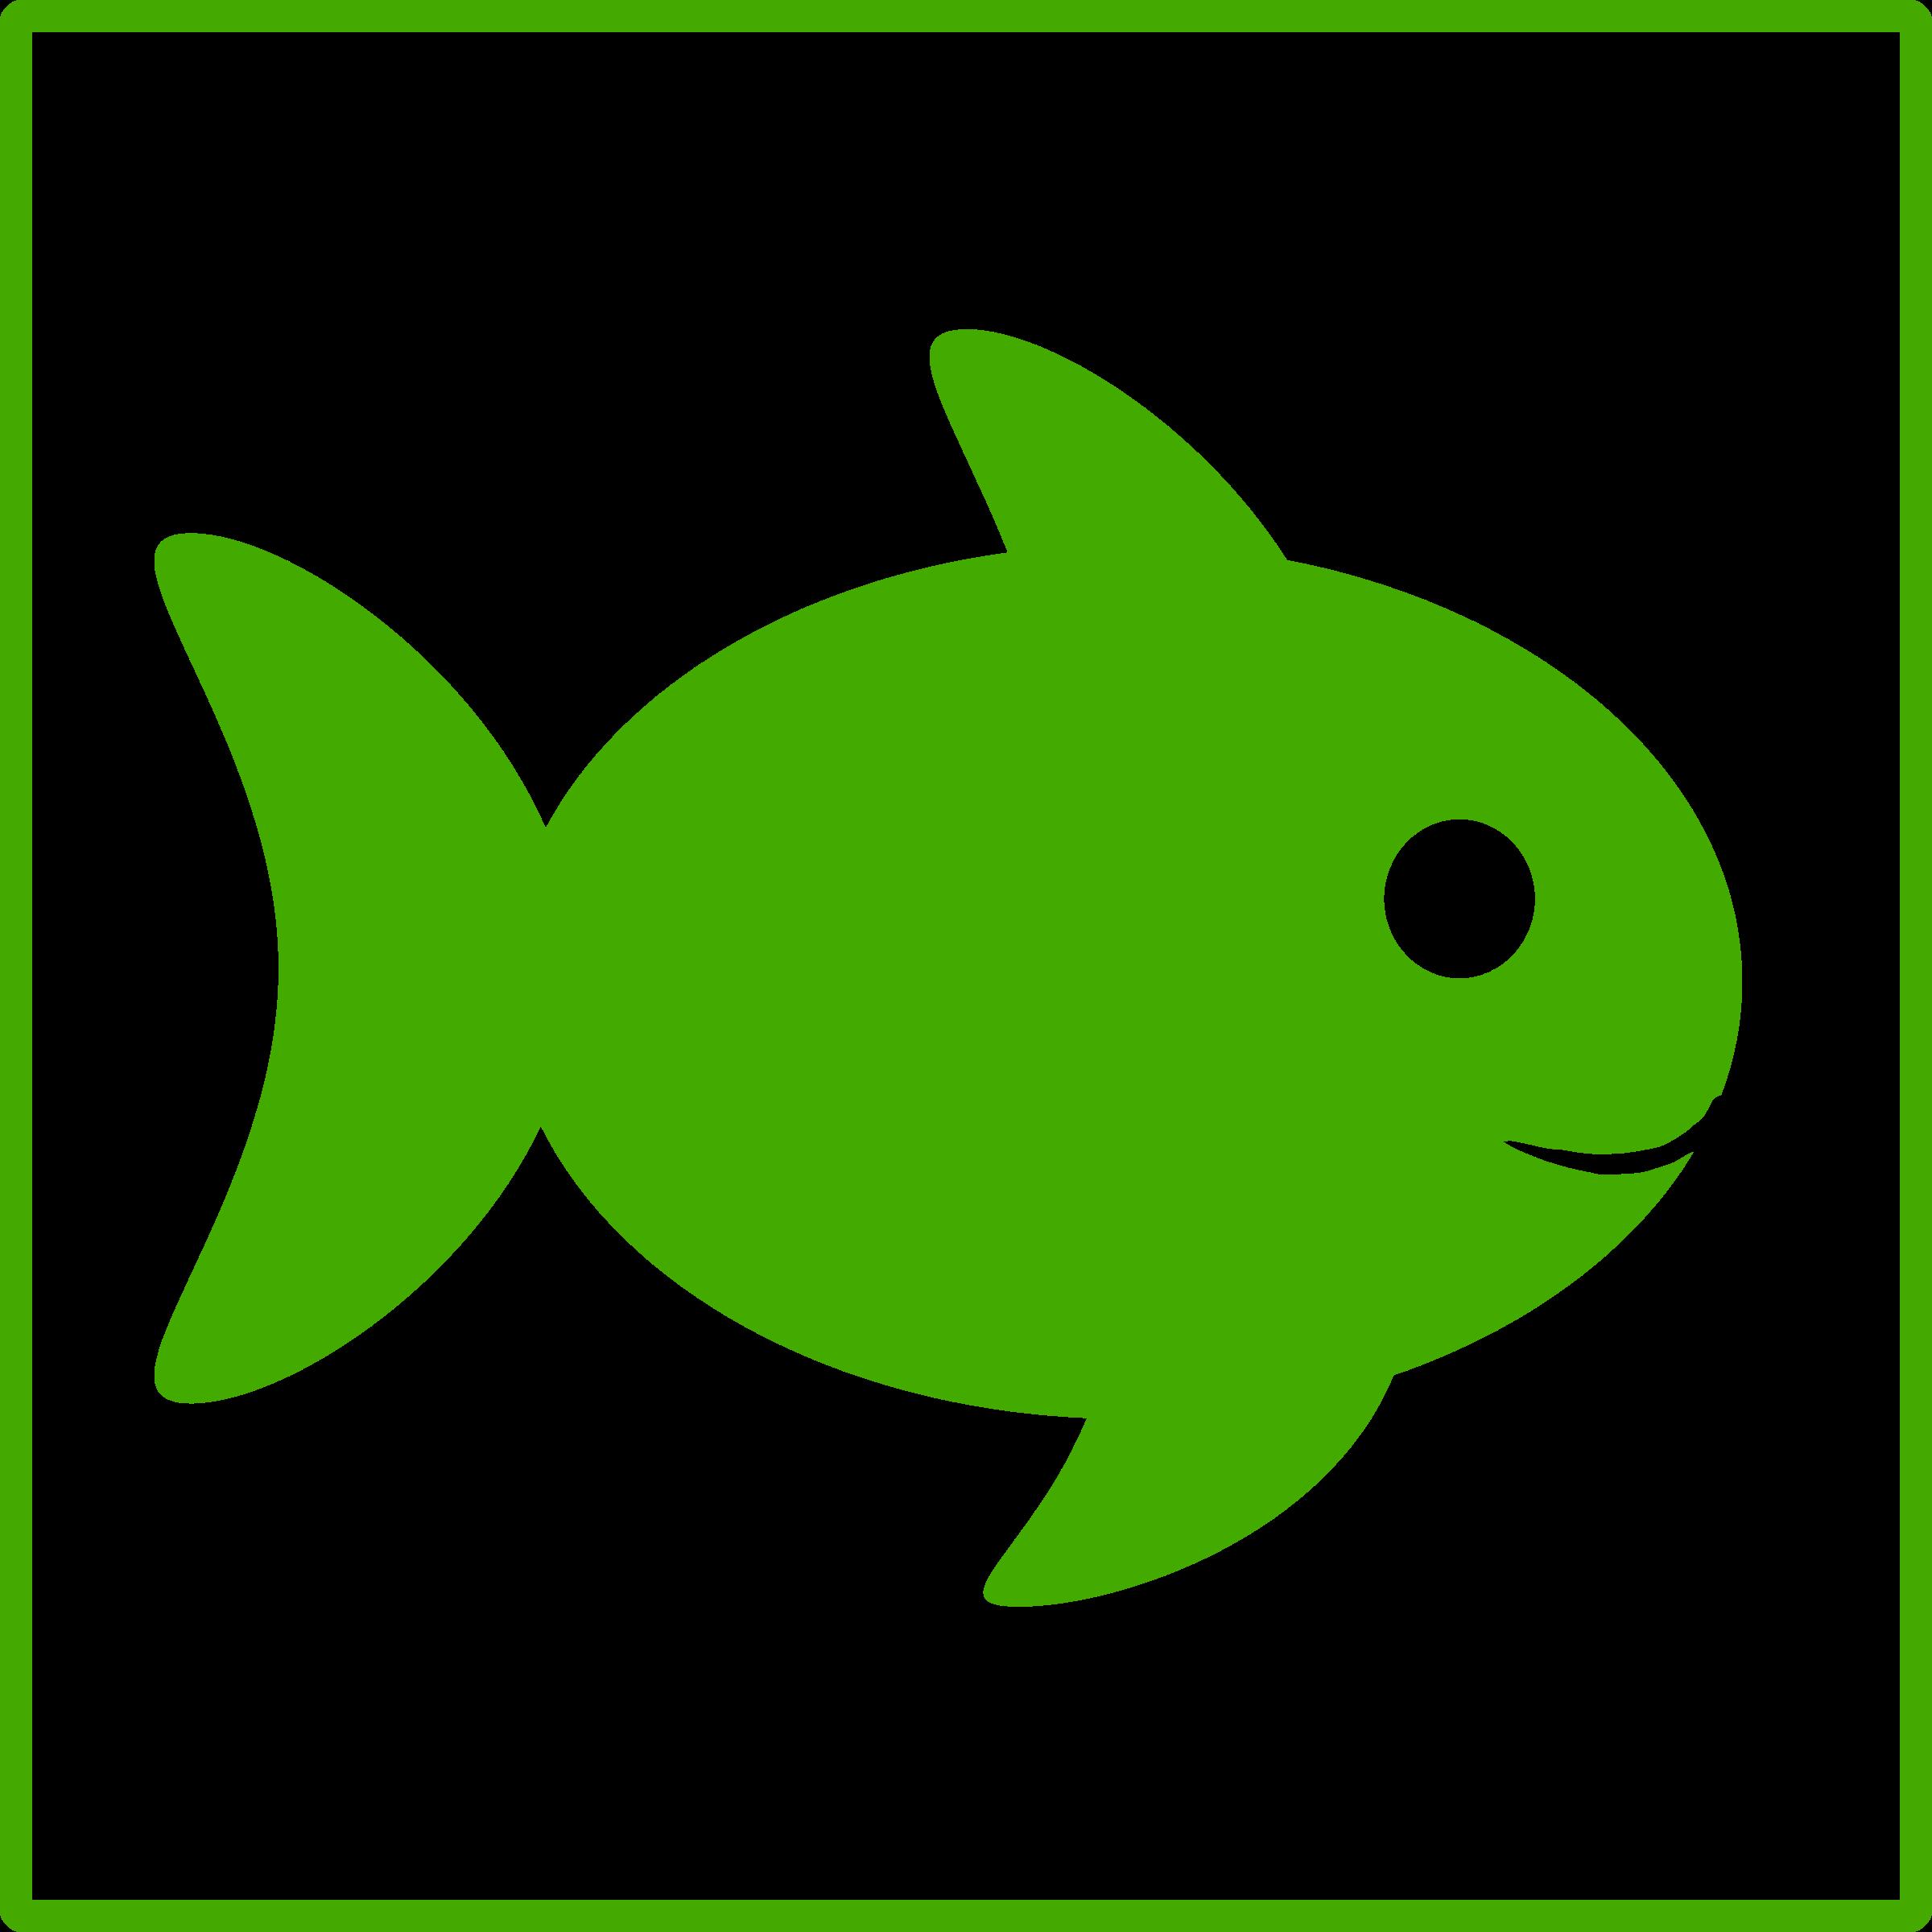 Fins clipart green fish Icon eco green Clipart green